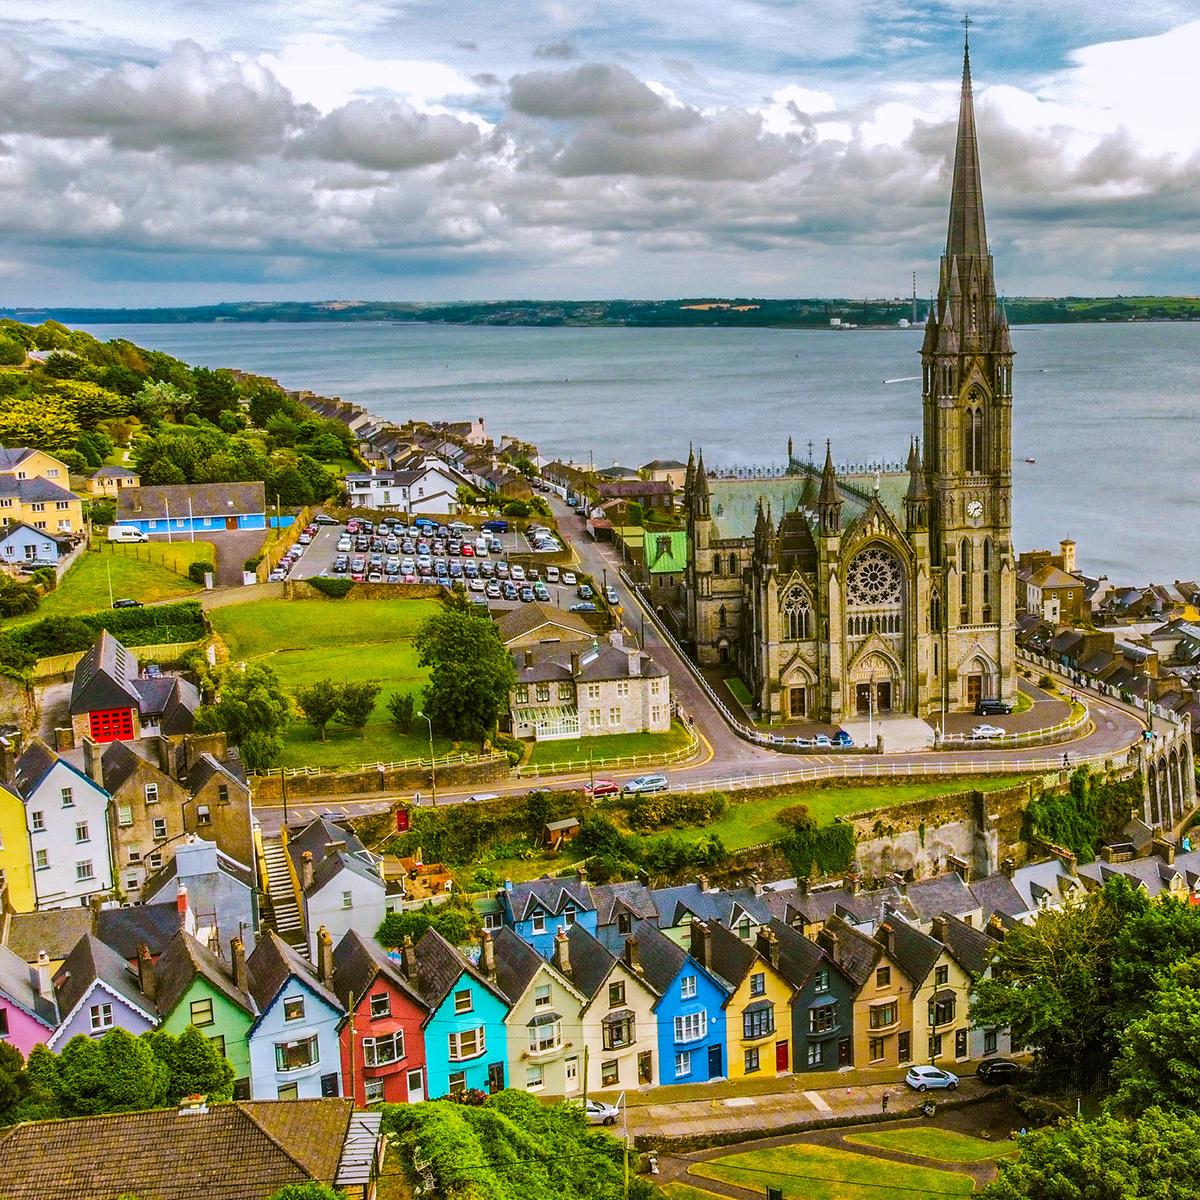 Rashed Henderson -Cobh, County Cork - We love Ireland